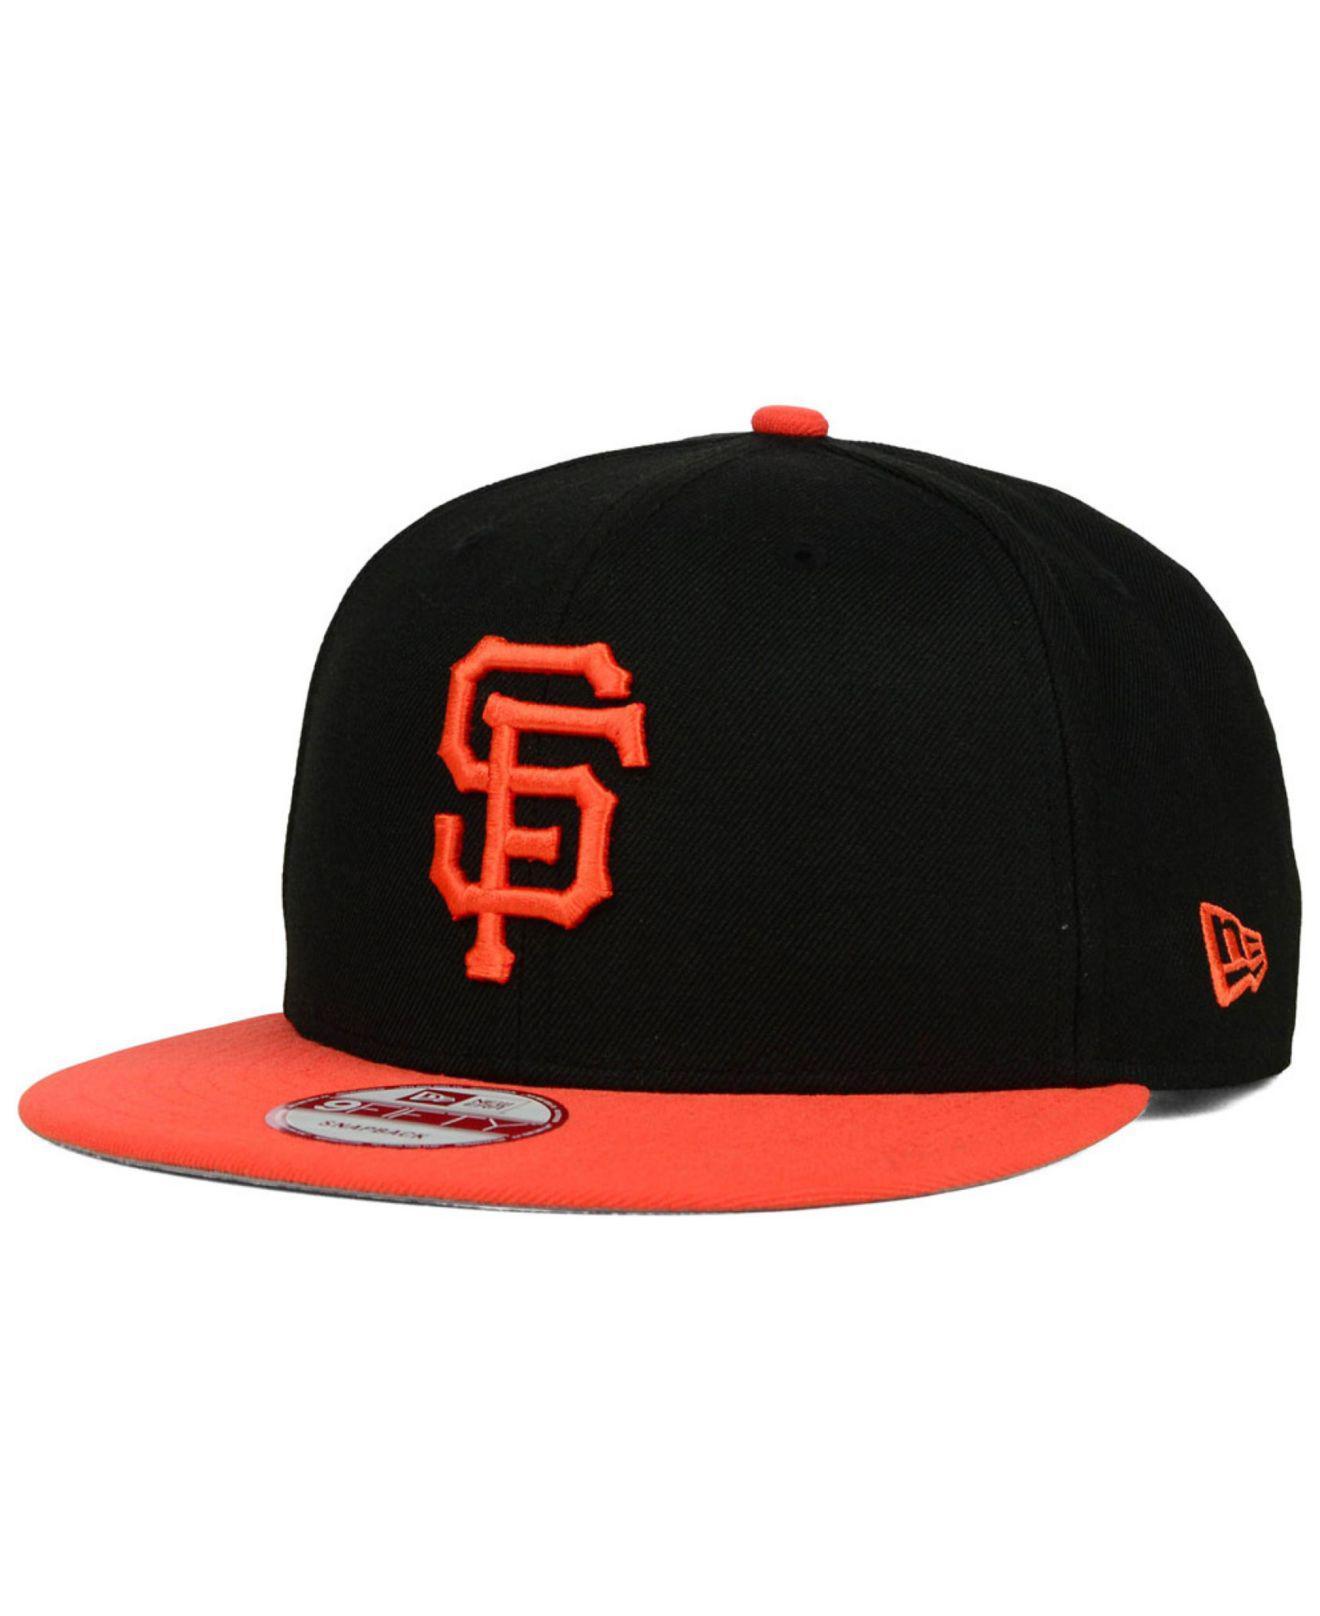 Lyst - KTZ San Francisco Giants 2-tone 9fifty Snapback Cap in Black ... 046d29dd4